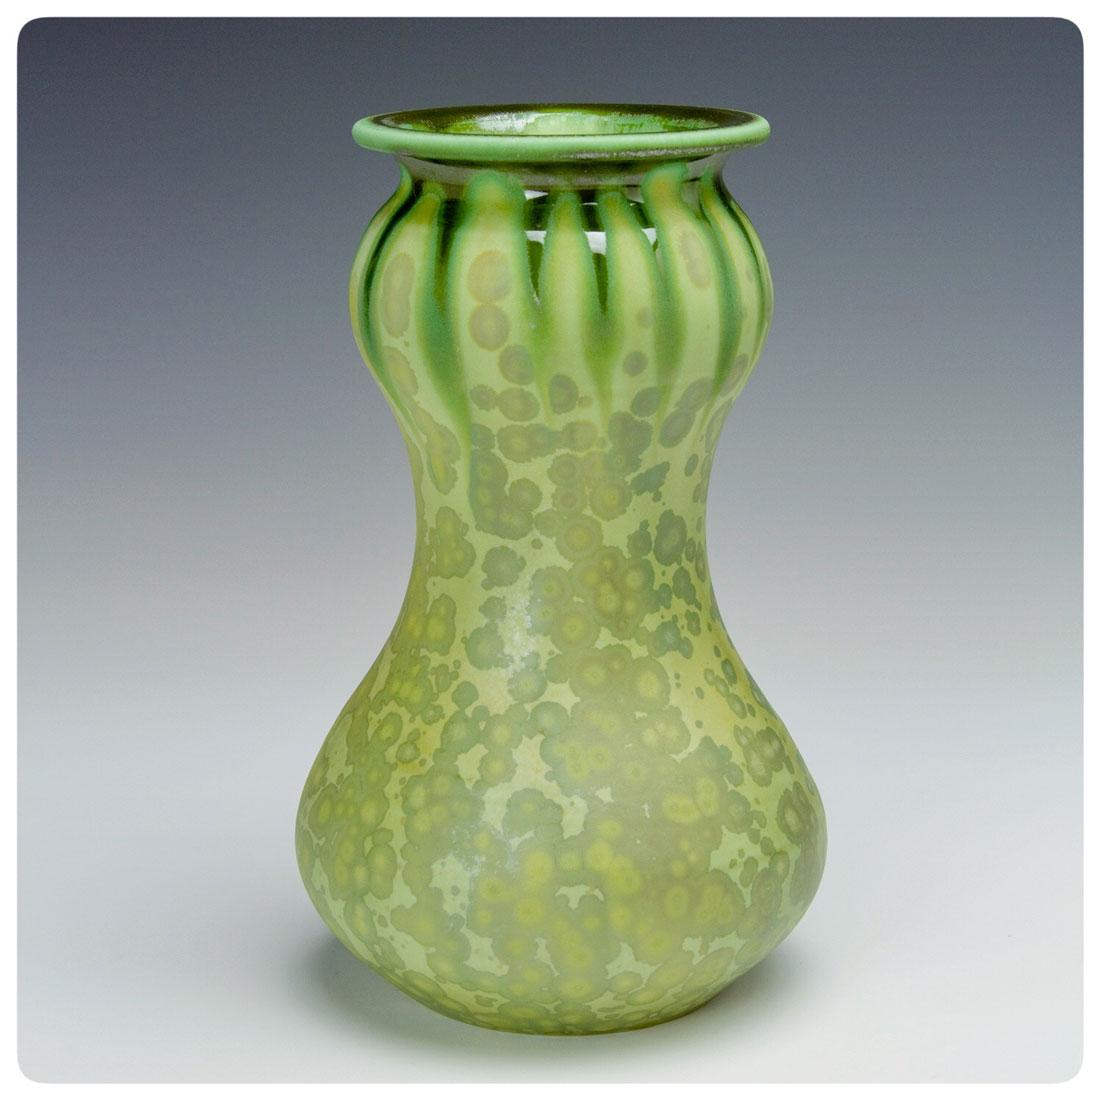 Copy of Crystalline molybdenum matte vase made by Bruce Gholson | Bulldog Pottery | Seagrove | North Carolina